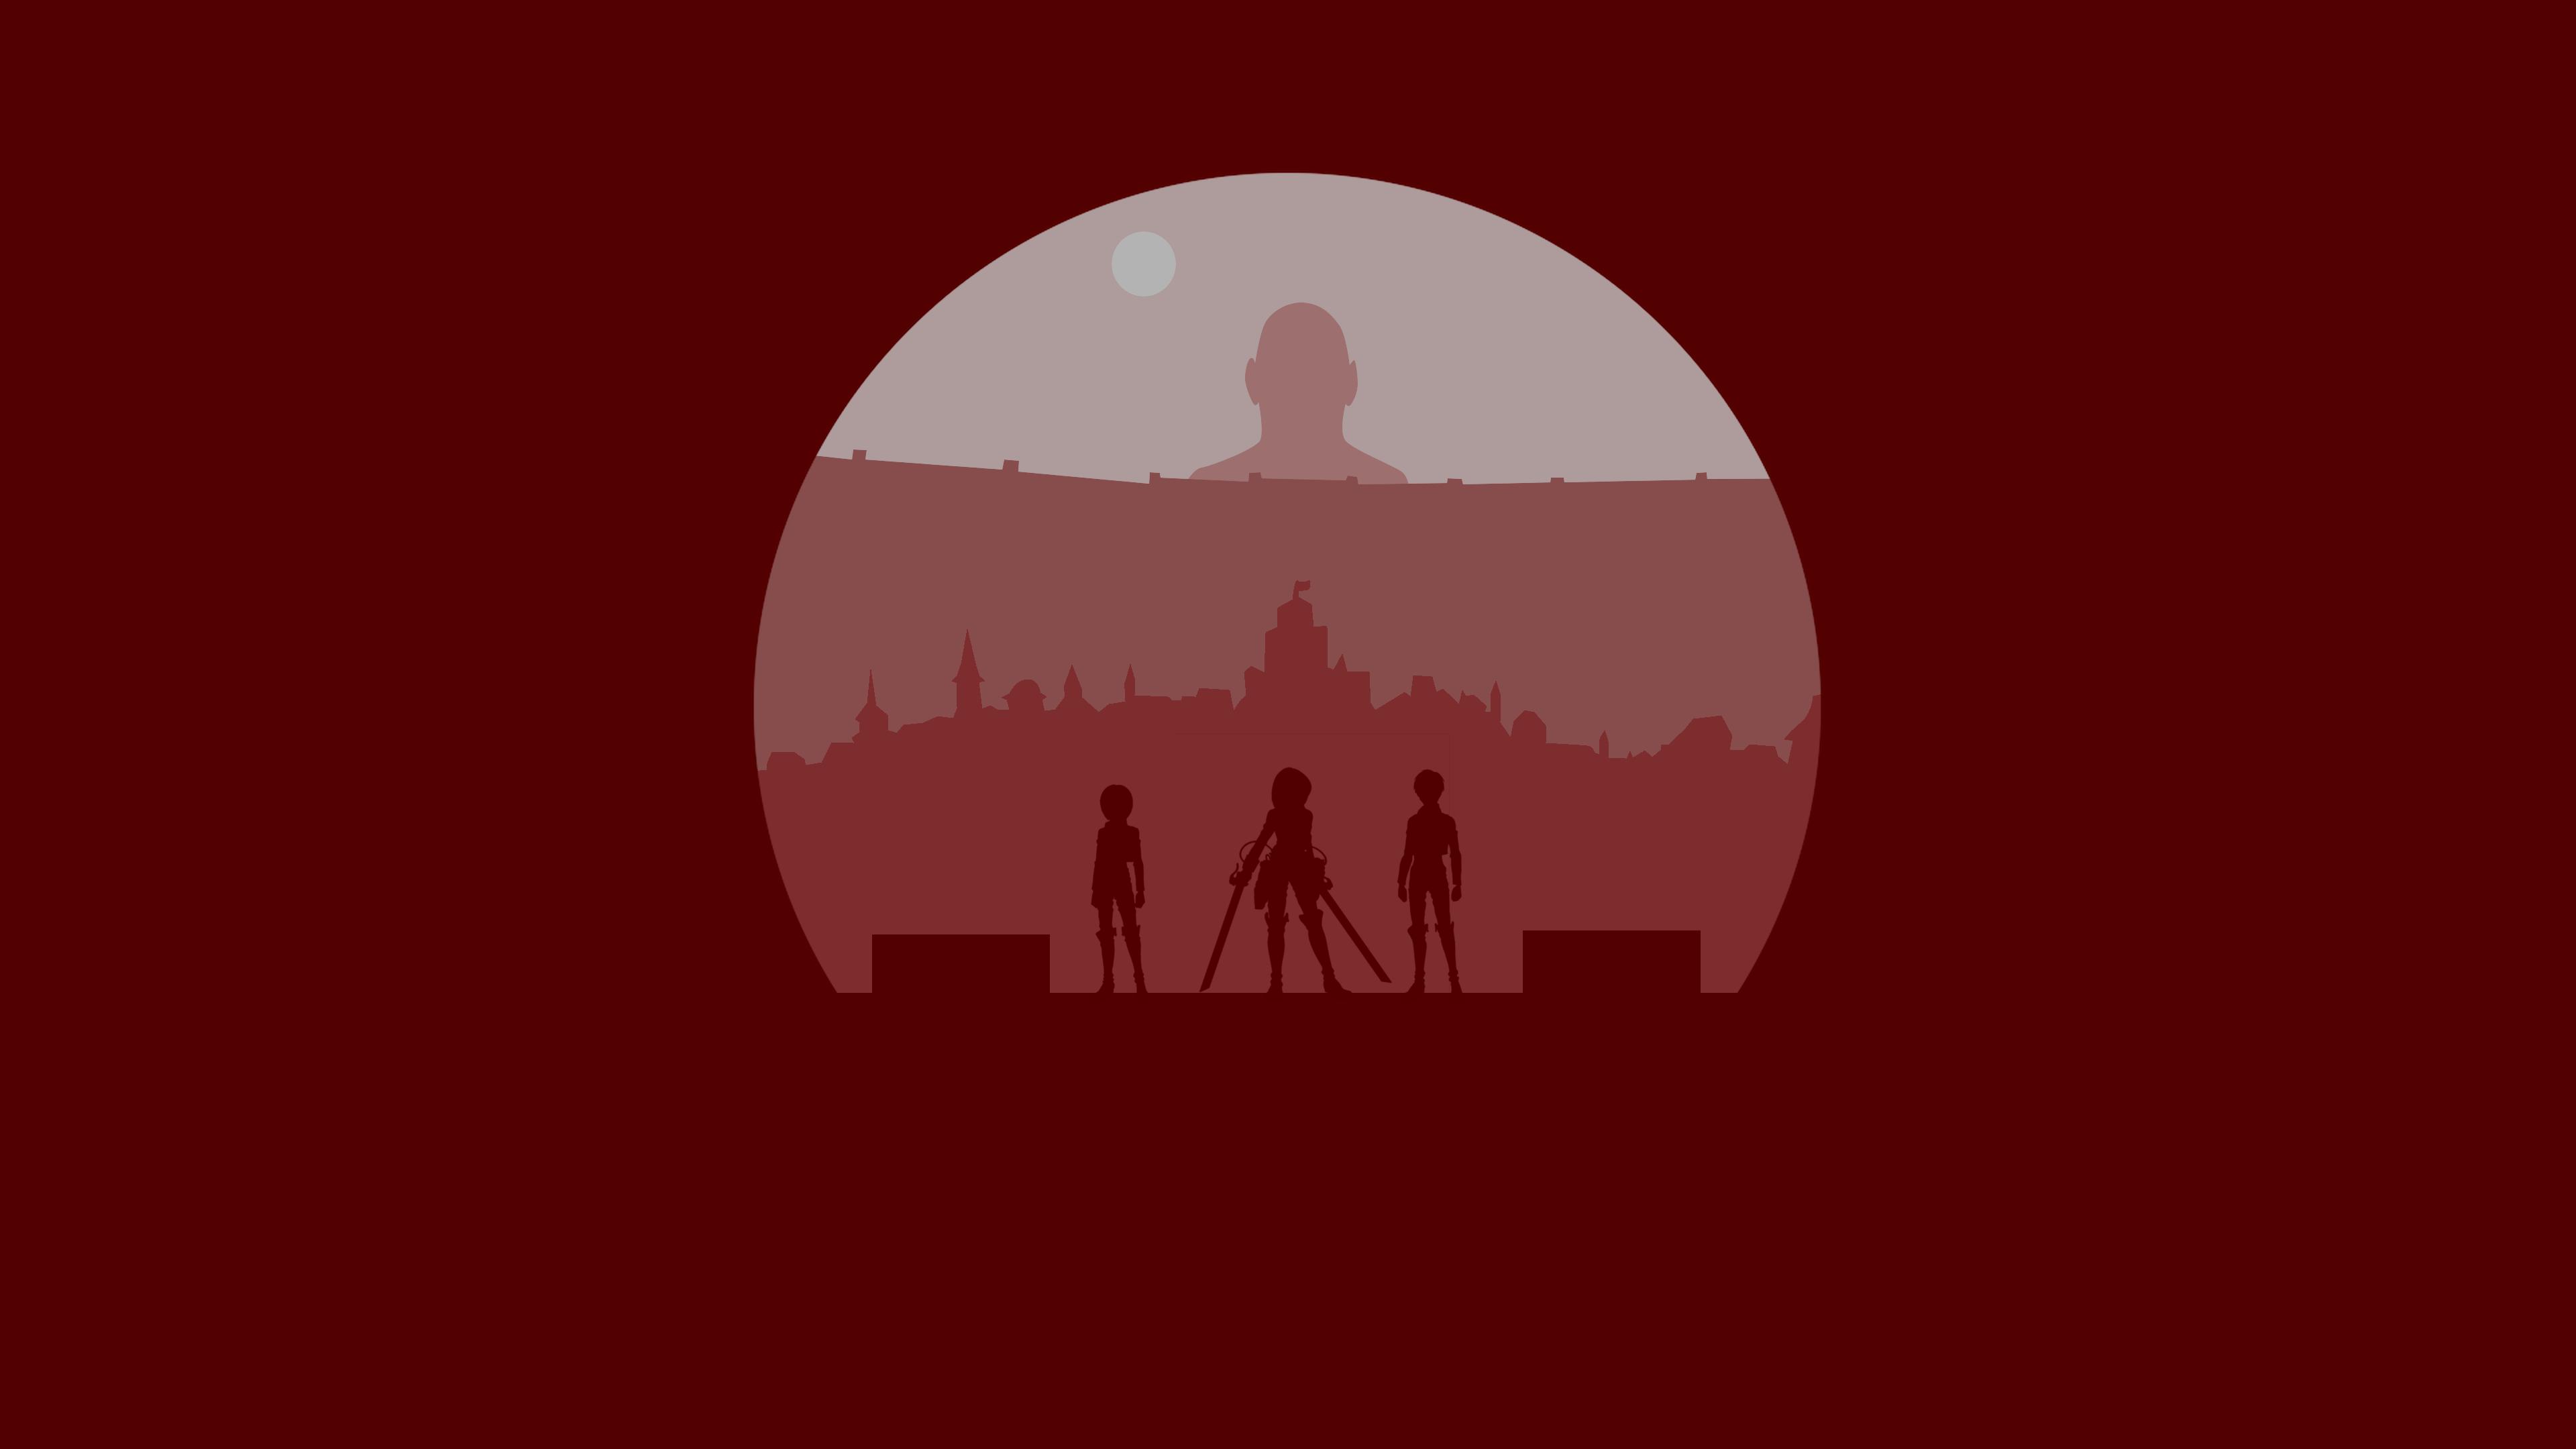 Minimalist Attack On Titan By Rubixcraft On Deviantart